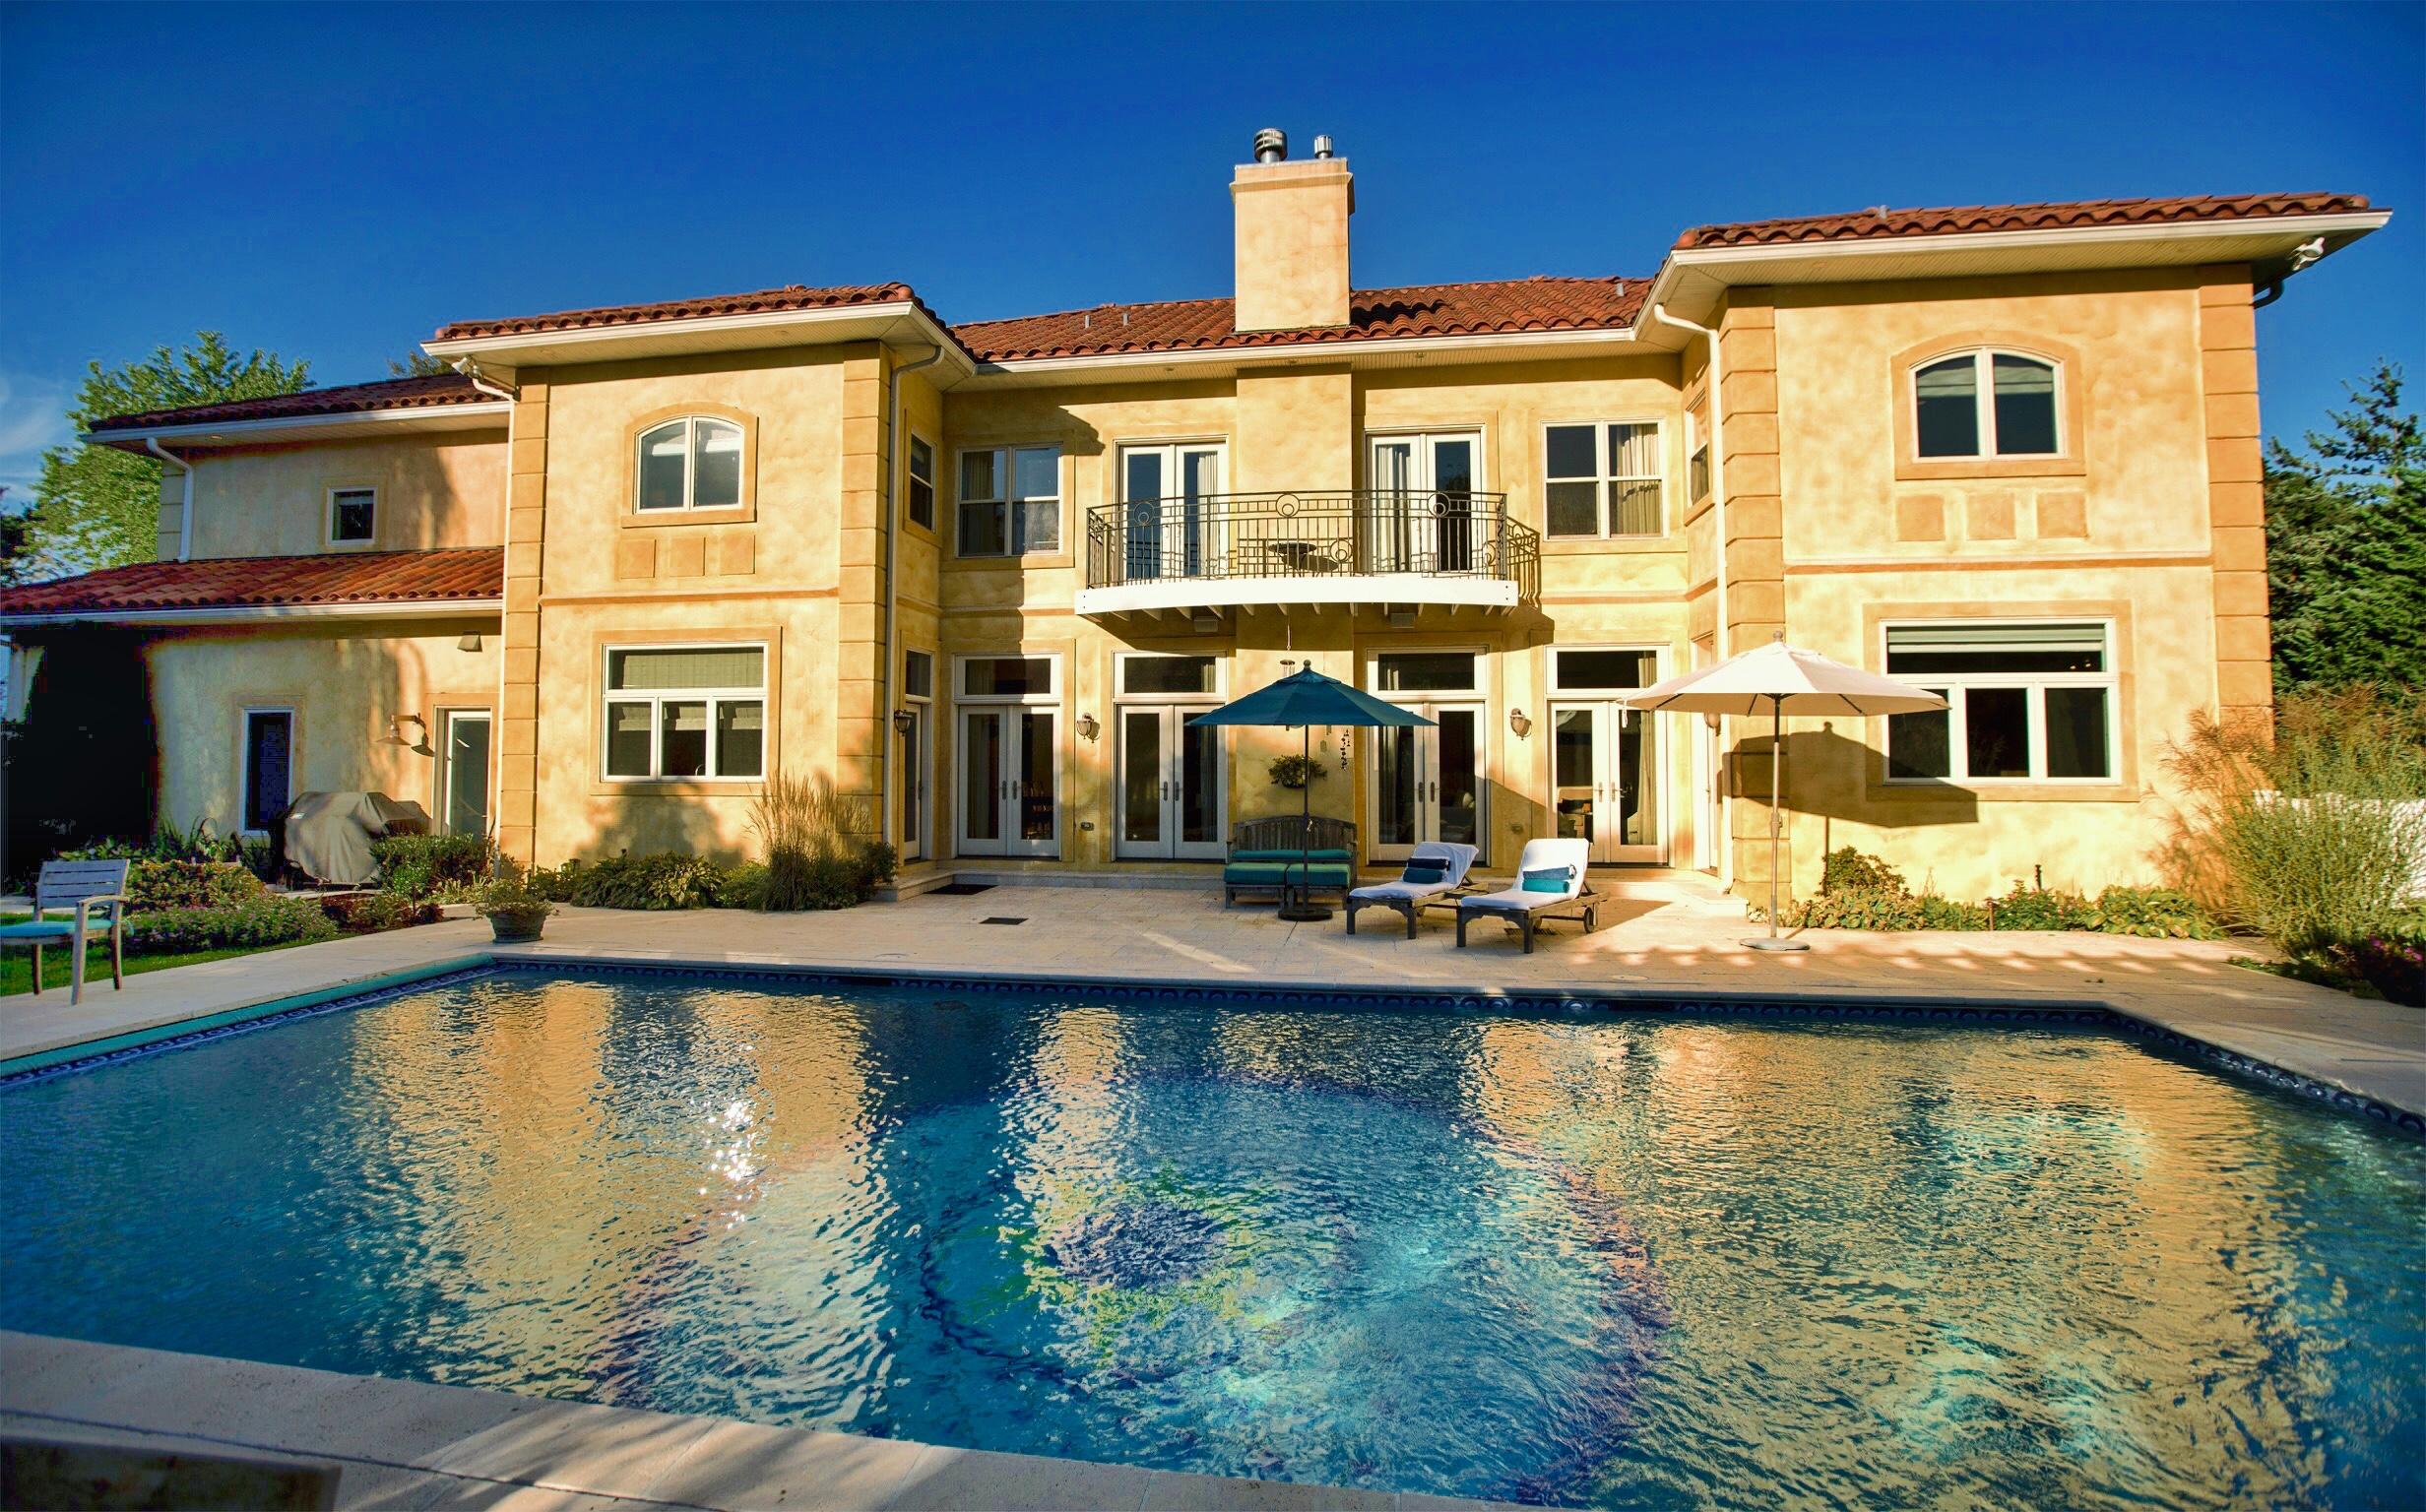 Property For Sale at Custon Built Mediterranean Style Villa